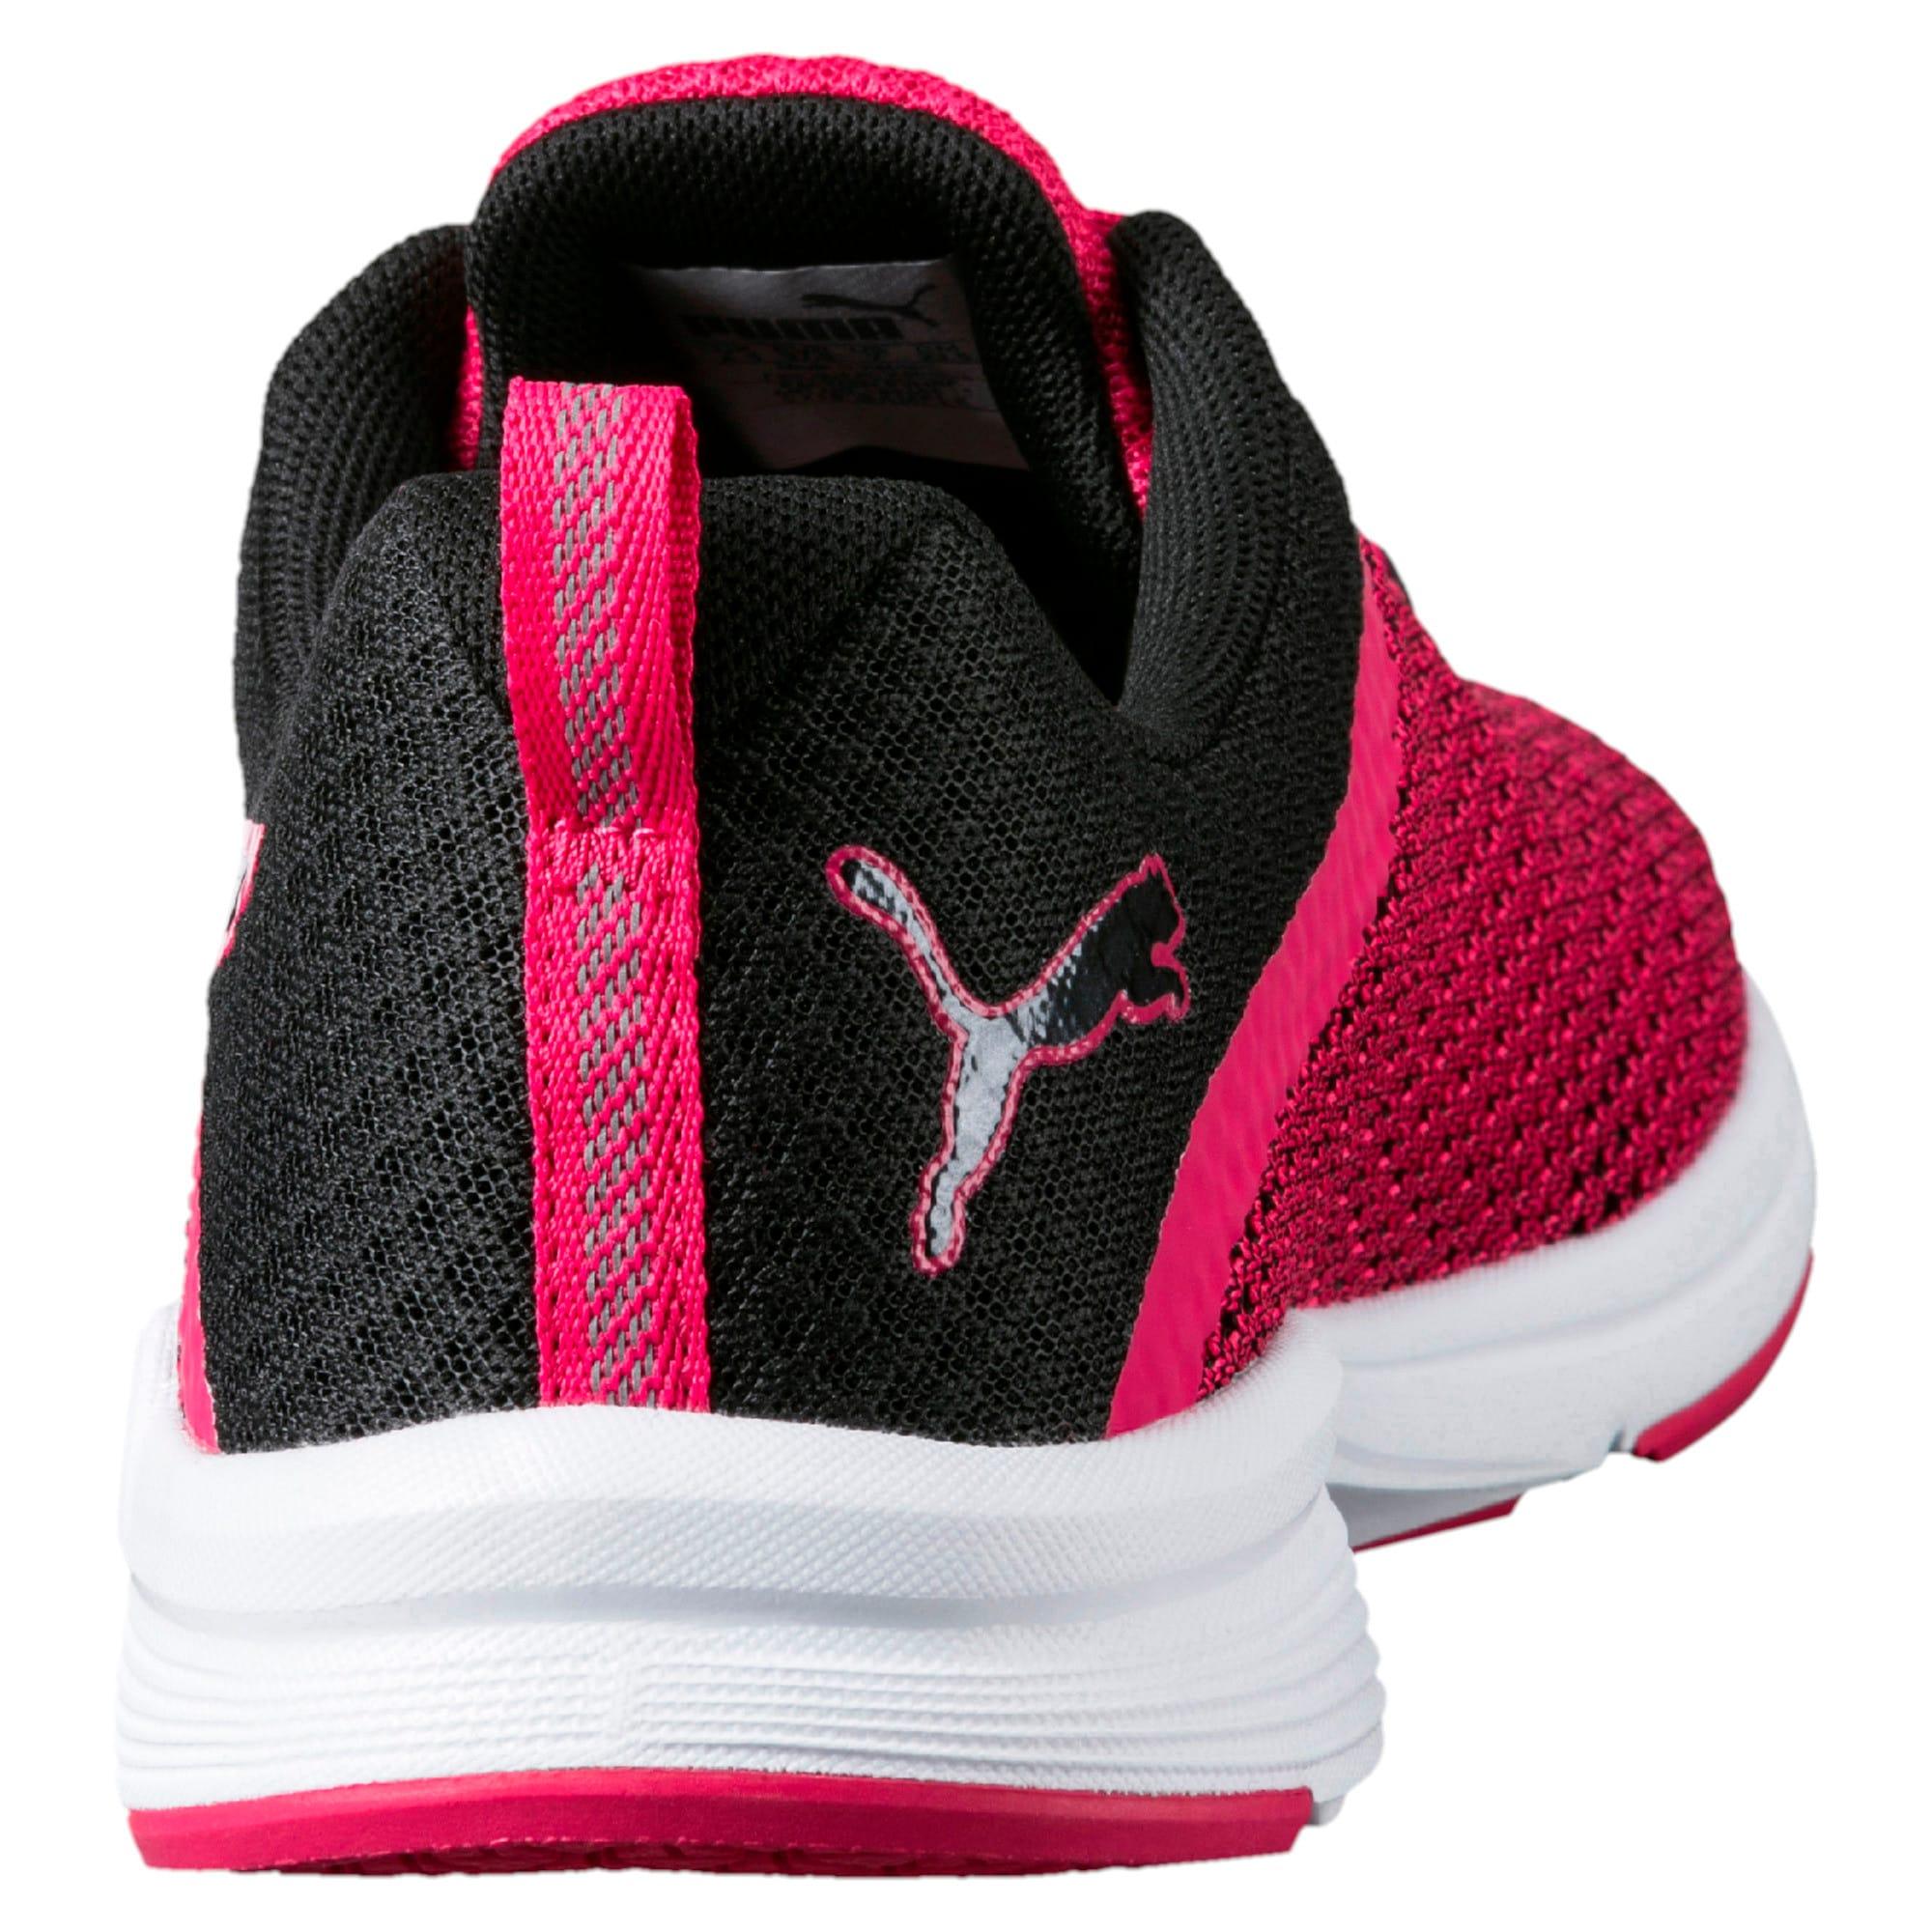 Thumbnail 3 of Pulse IGNITE XT Women's Training Shoes, Love Potion-Puma Black, medium-IND